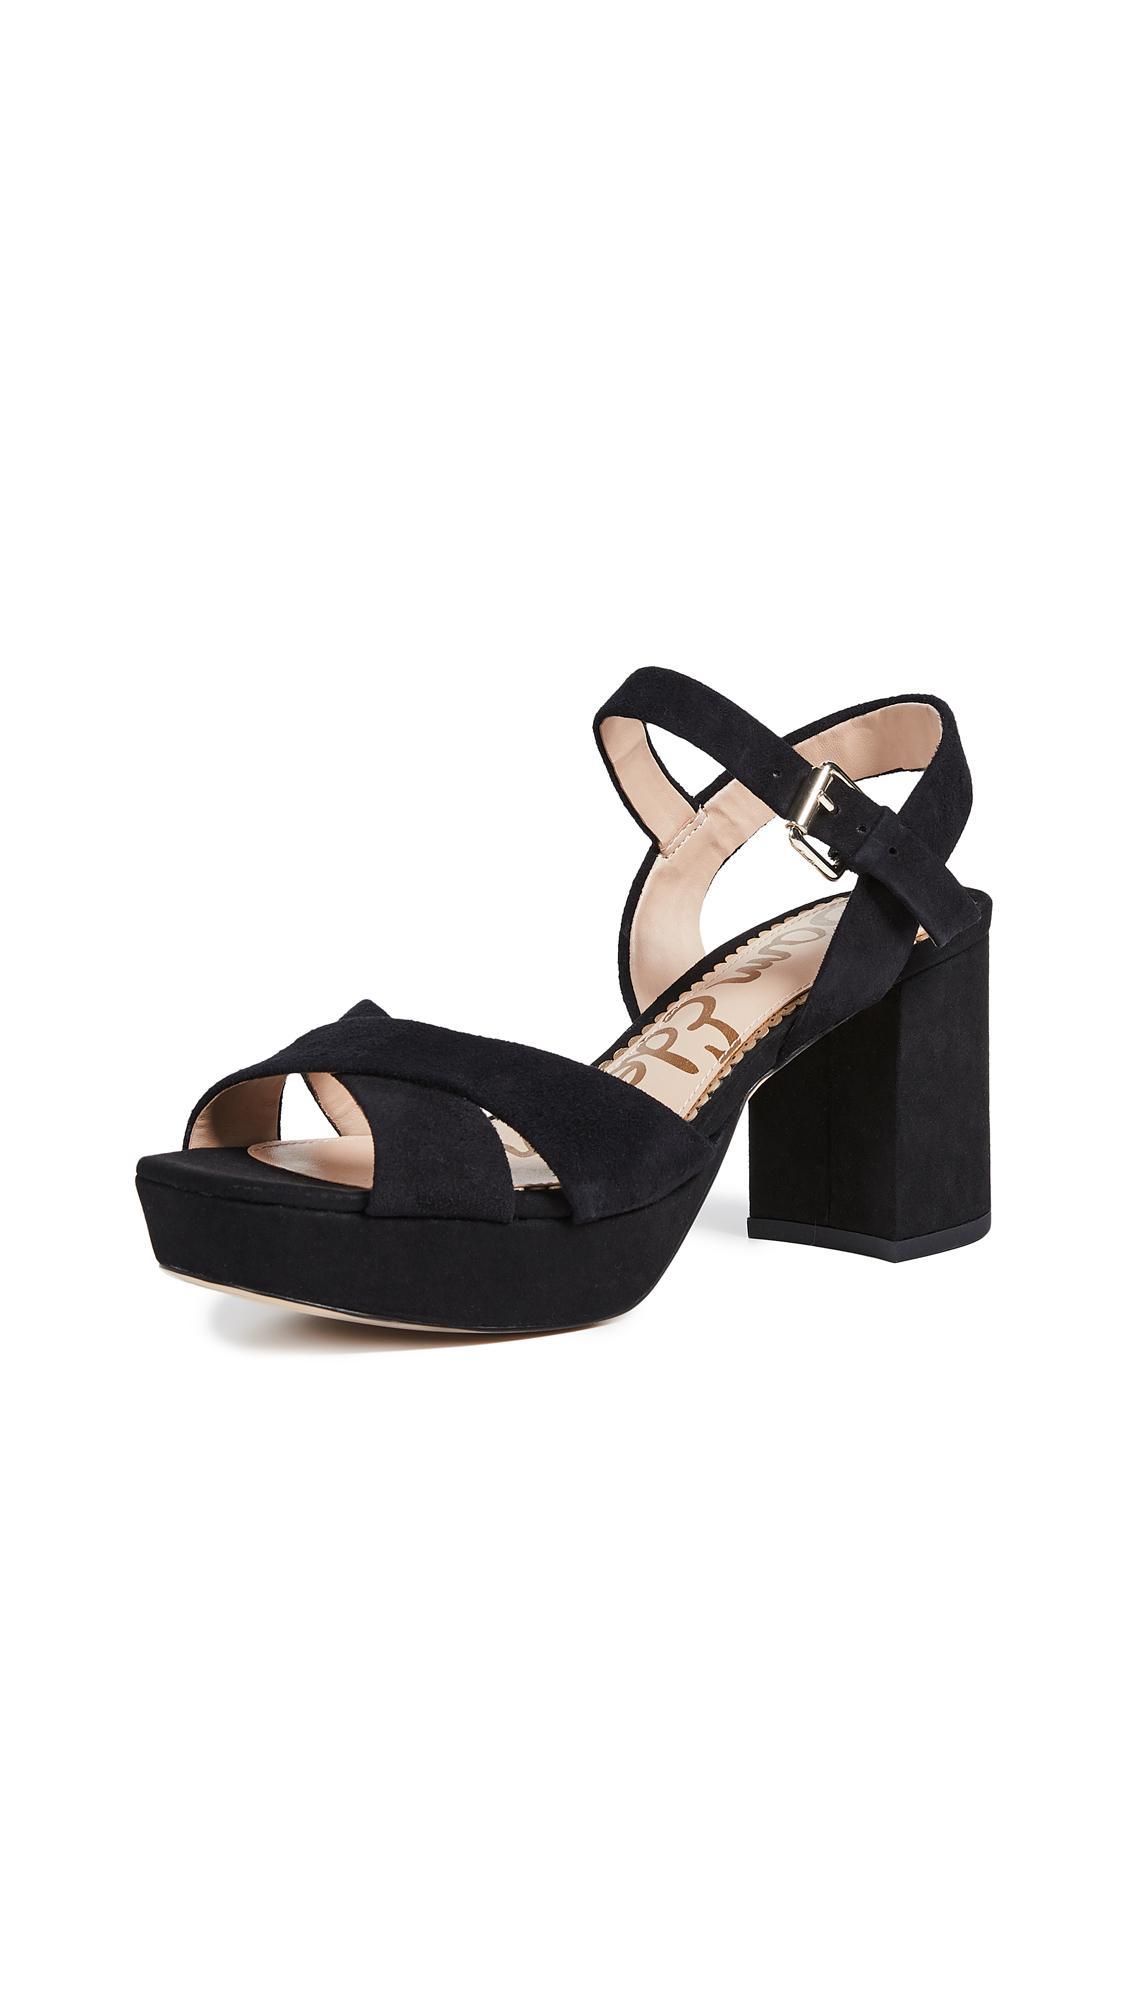 a0e415dd9aa Lyst - Sam Edelman Jolene Platform Sandals in Black